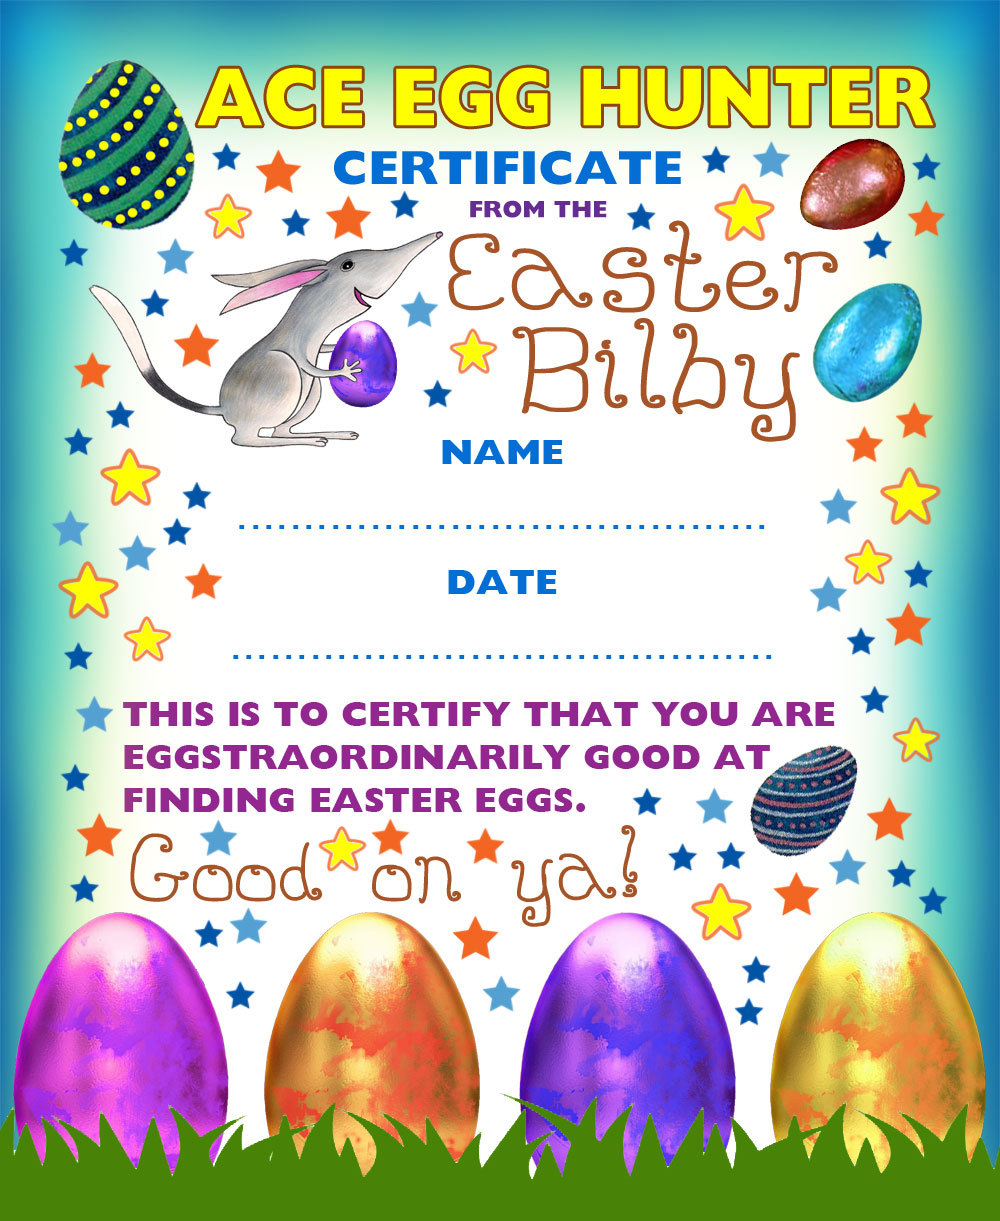 easter bilby certificate ace egg hunter rooftop post